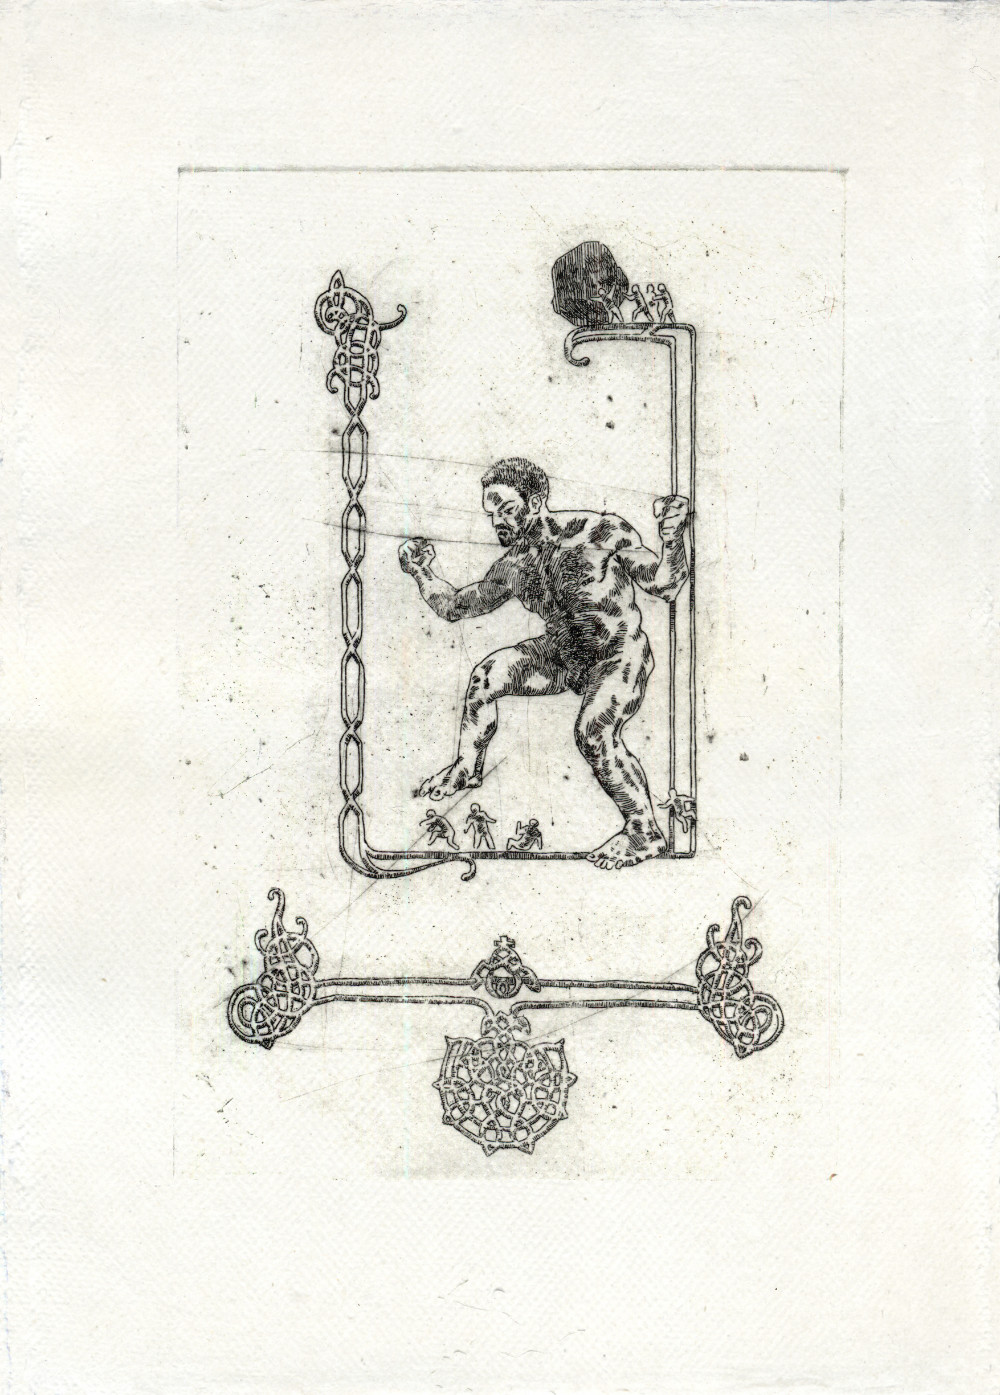 Zoltan korcsok etching 6